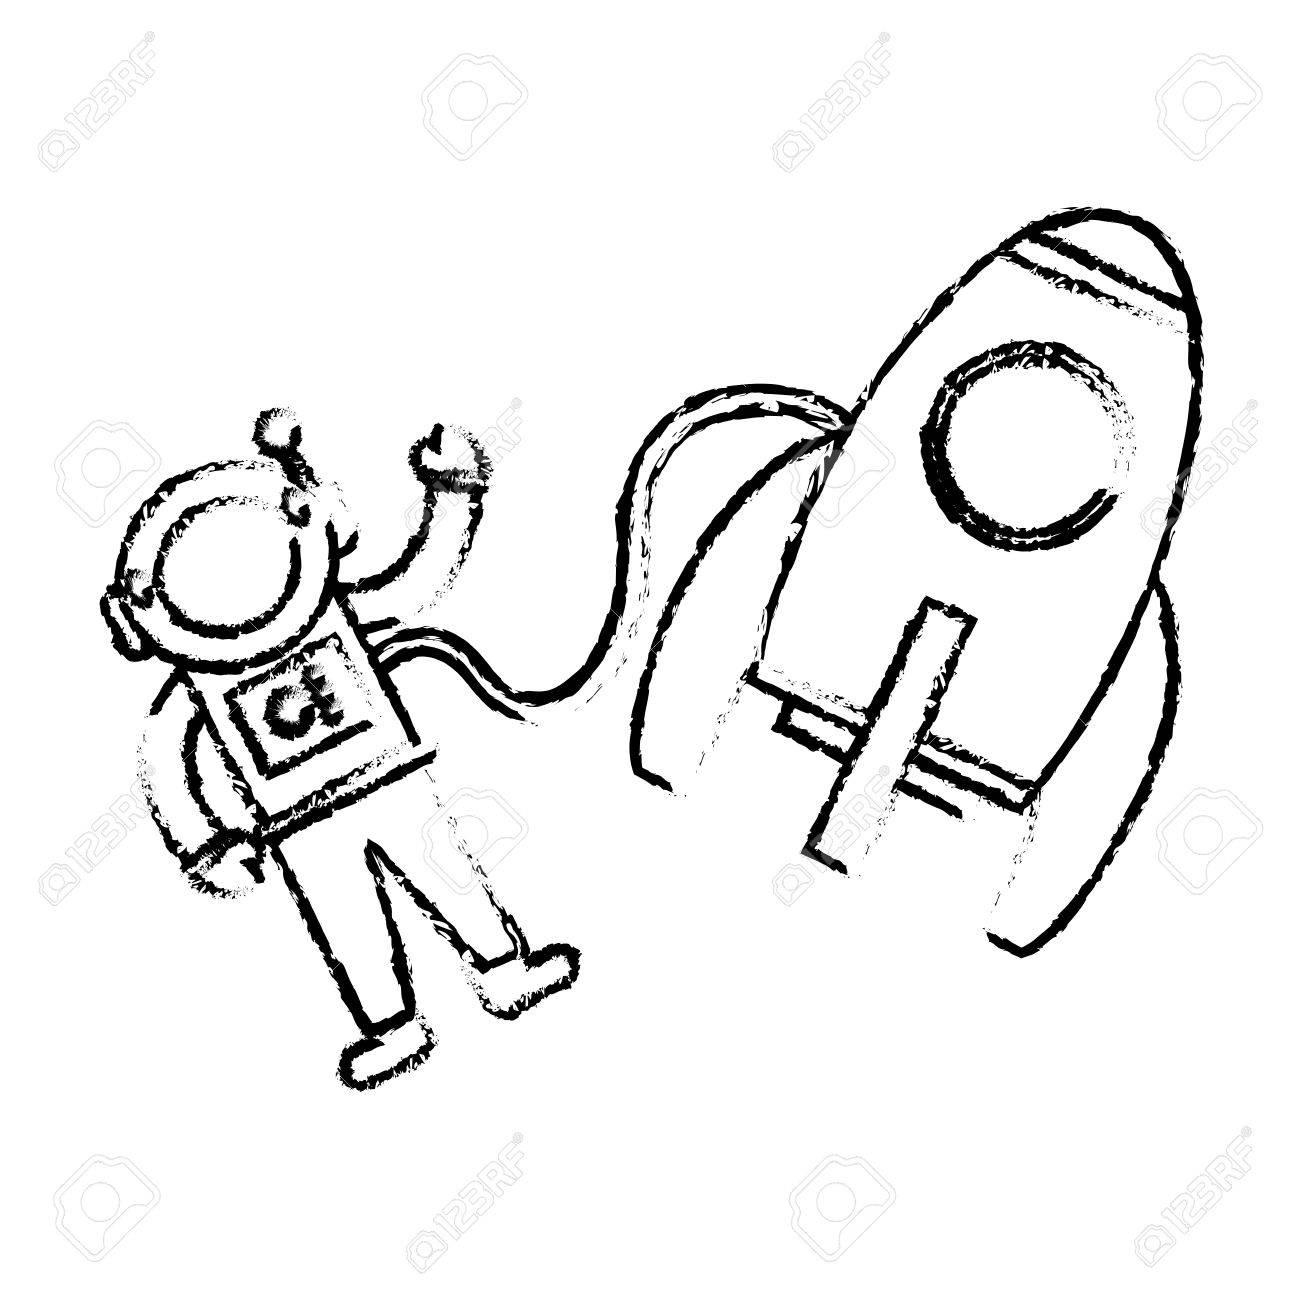 1300x1300 Astronaut Rocket Floating Sketch Vector Illustration Eps 10